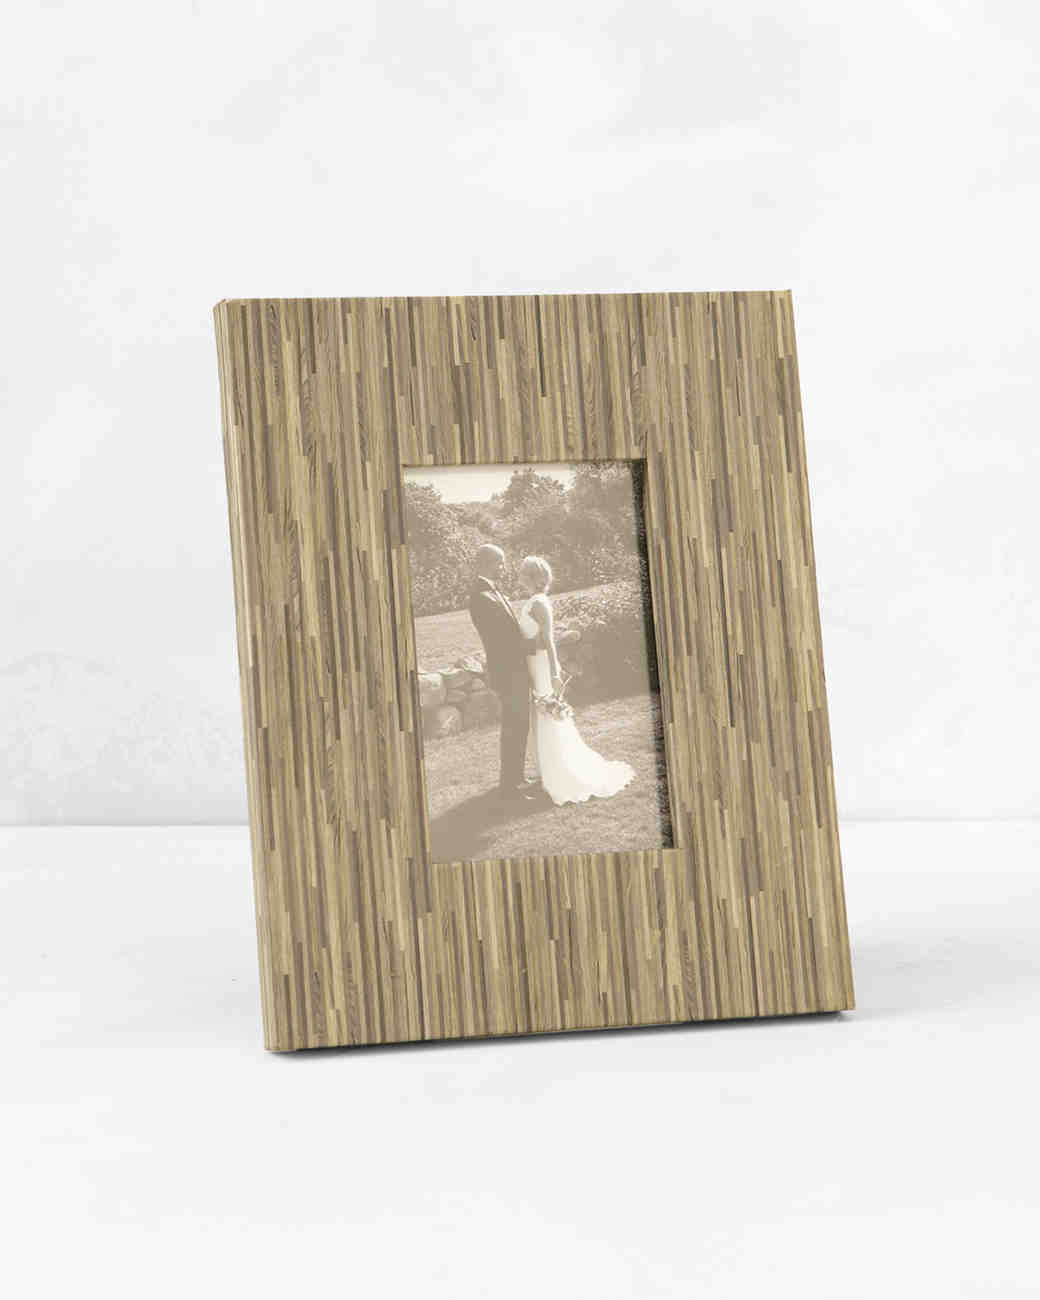 reed-barton-frame-mwd108187.jpg